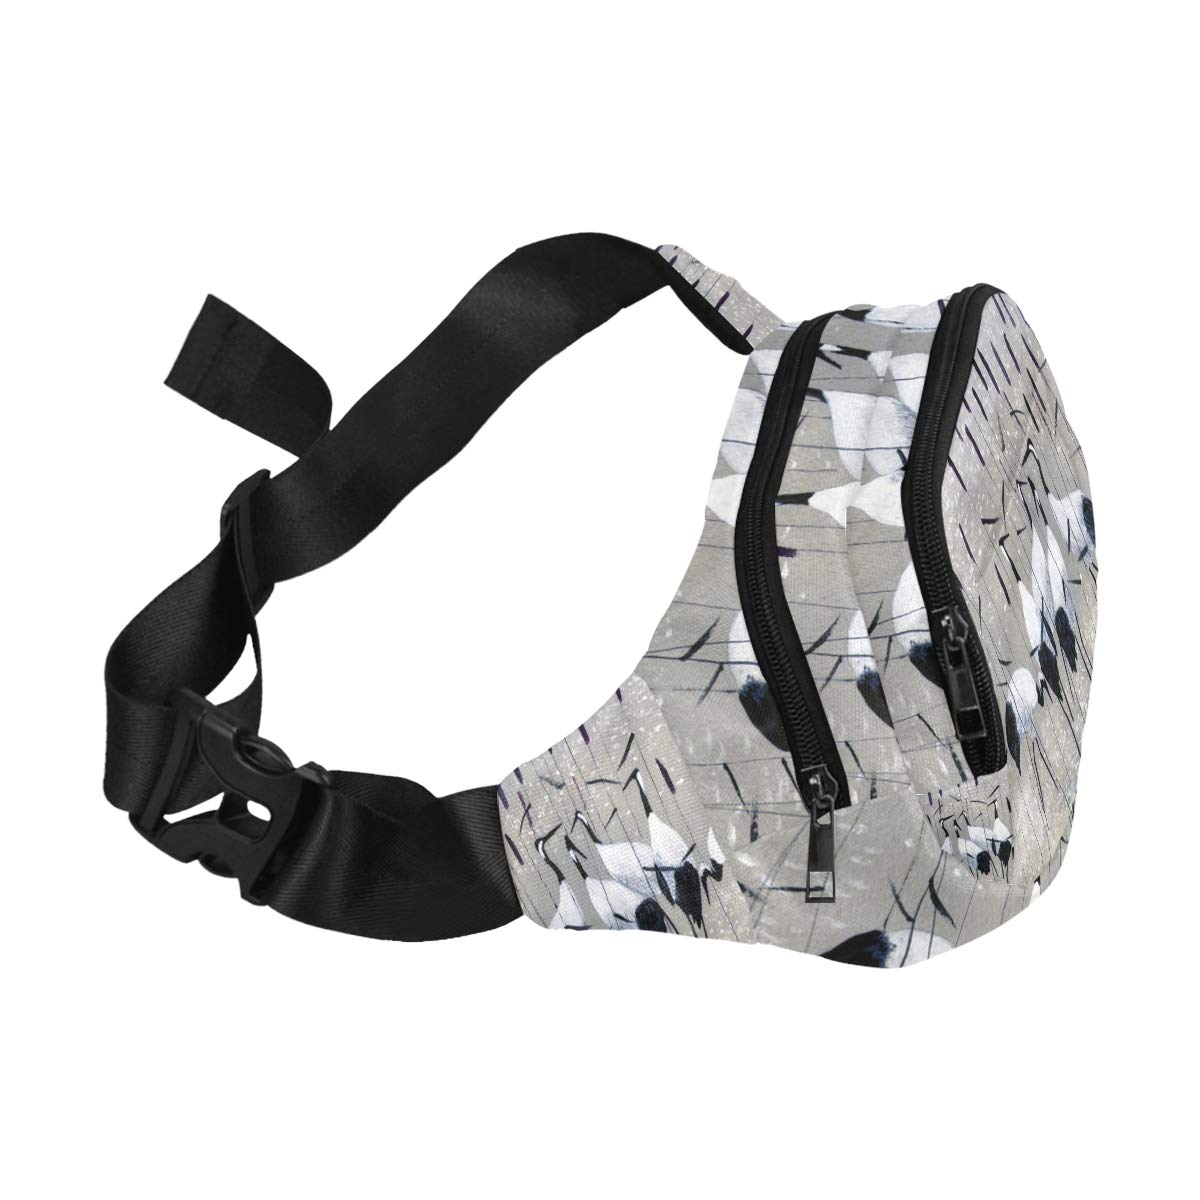 Decorative Oriental Pattern Fenny Packs Waist Bags Adjustable Belt Waterproof Nylon Travel Running Sport Vacation Party For Men Women Boys Girls Kids